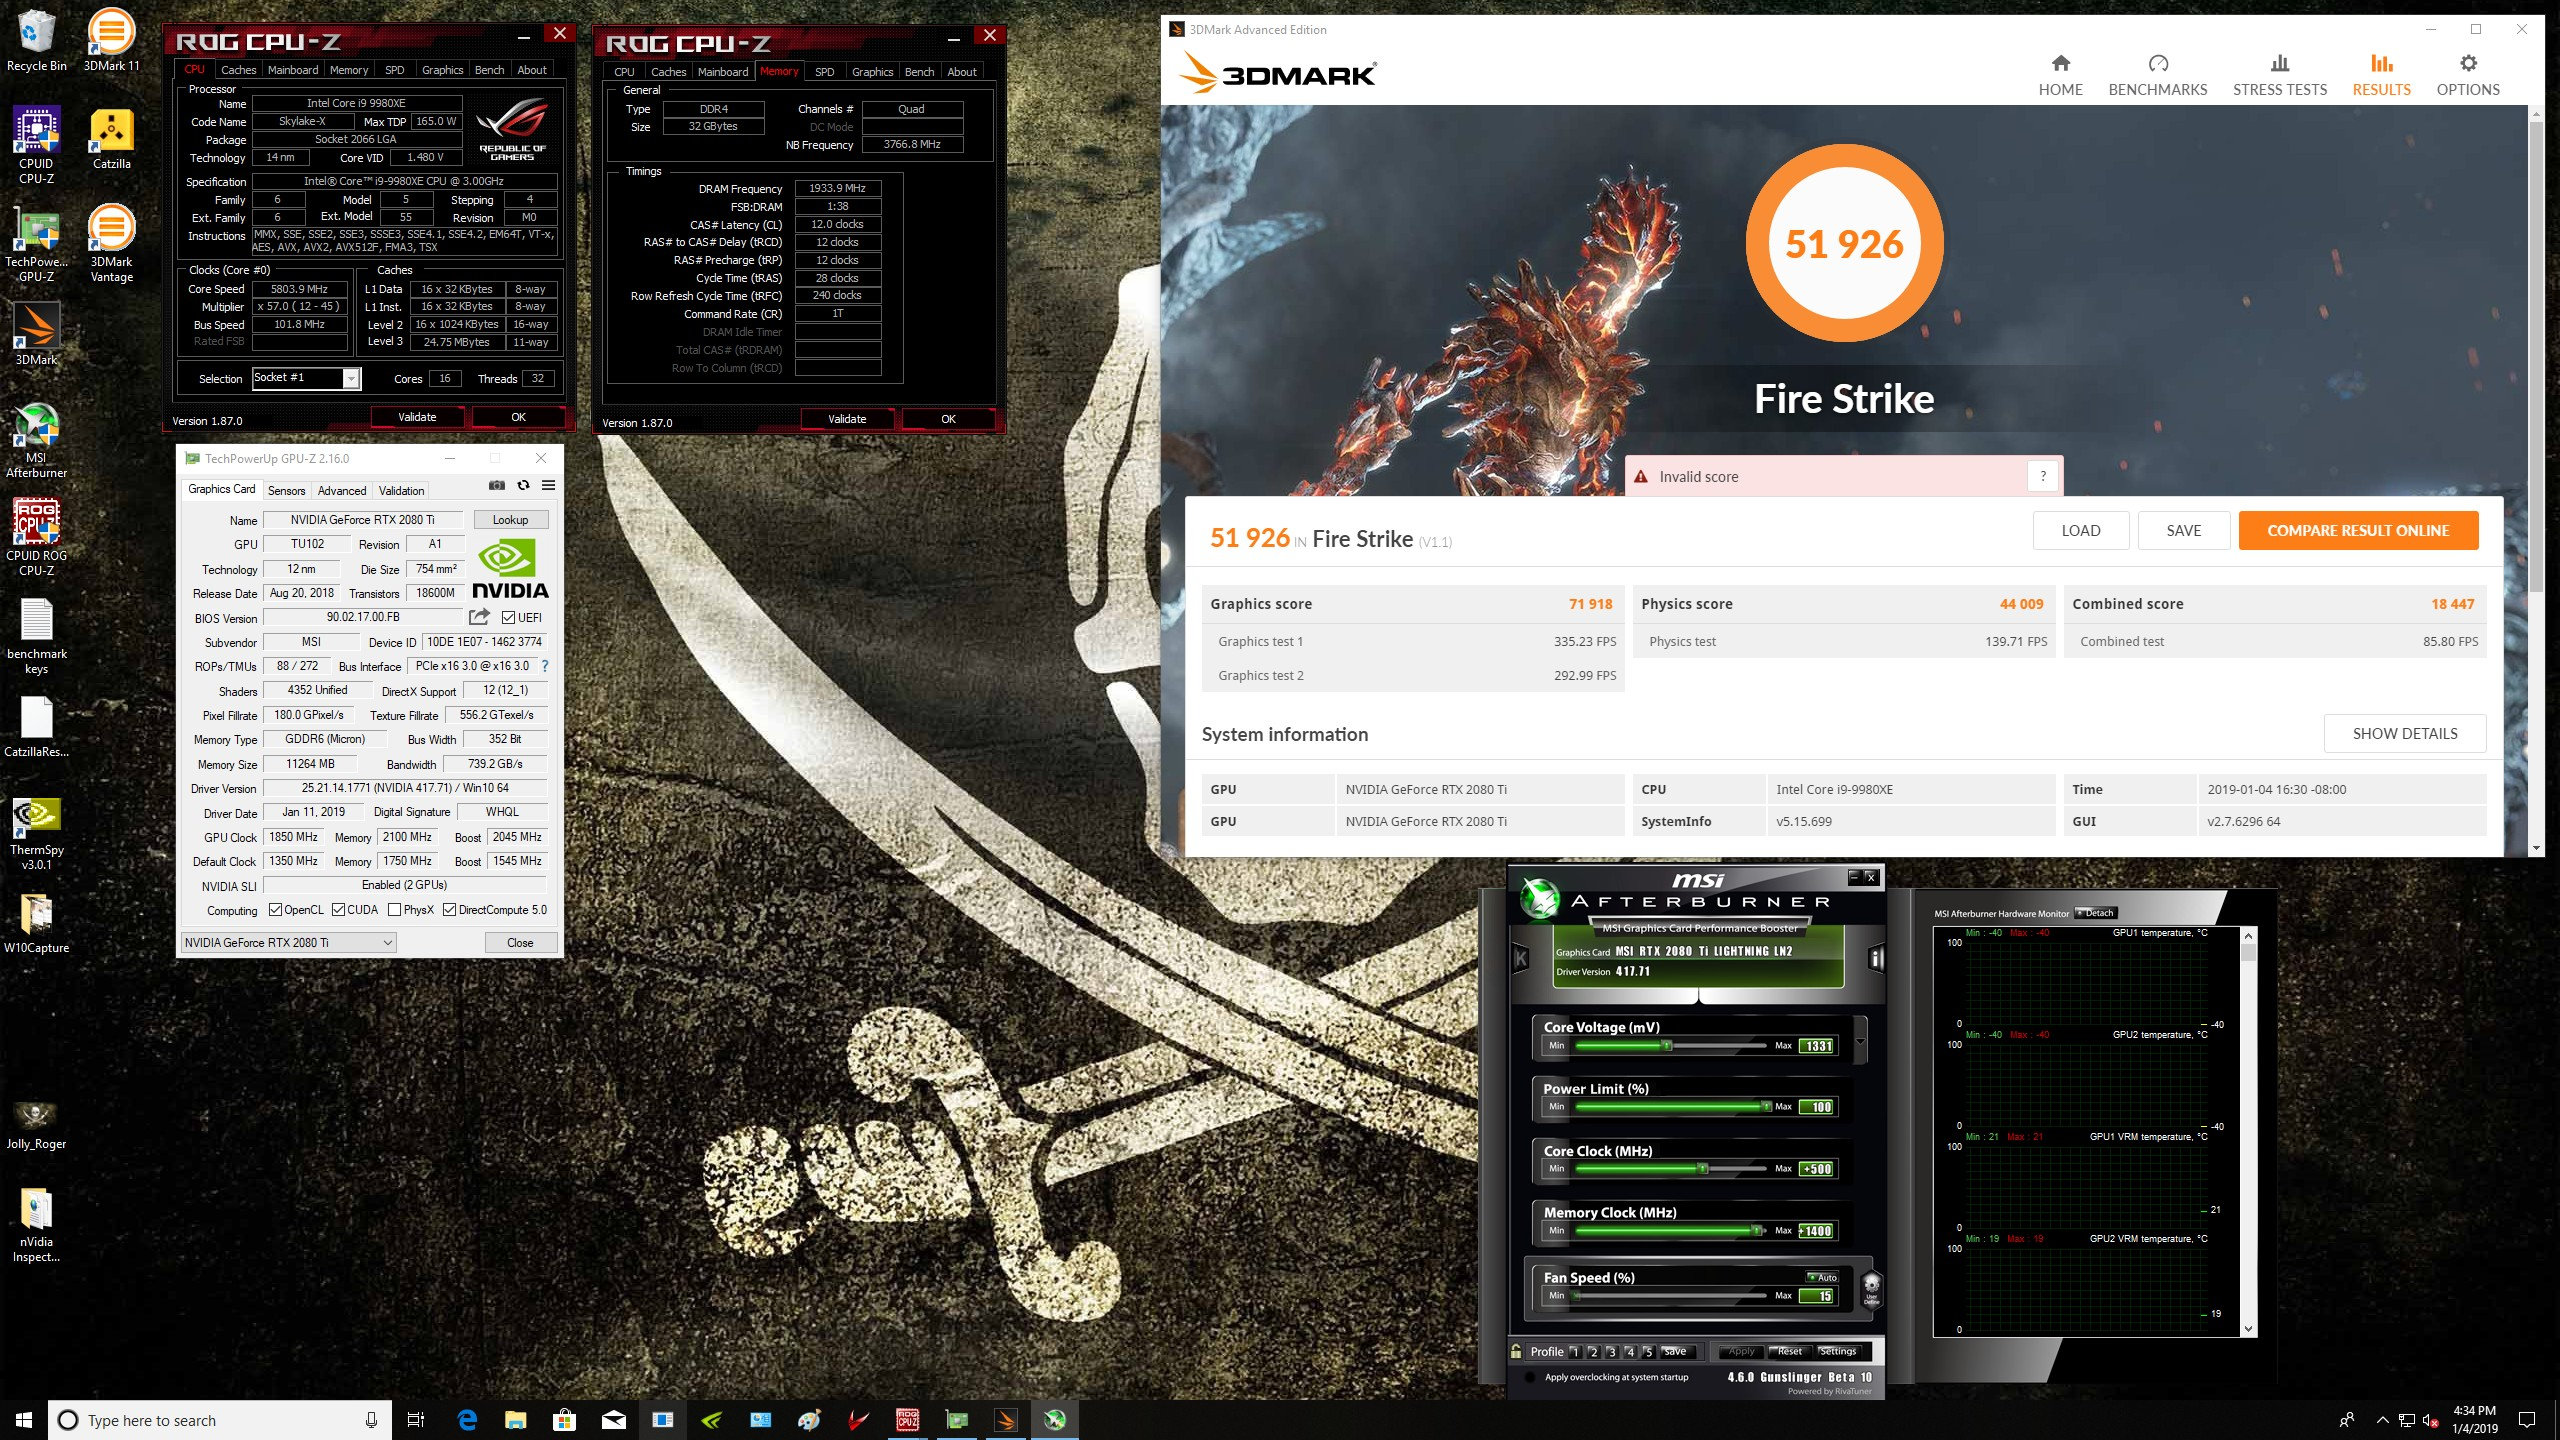 Gunslinger`s 3DMark - Fire Strike score: 51926 marks with a